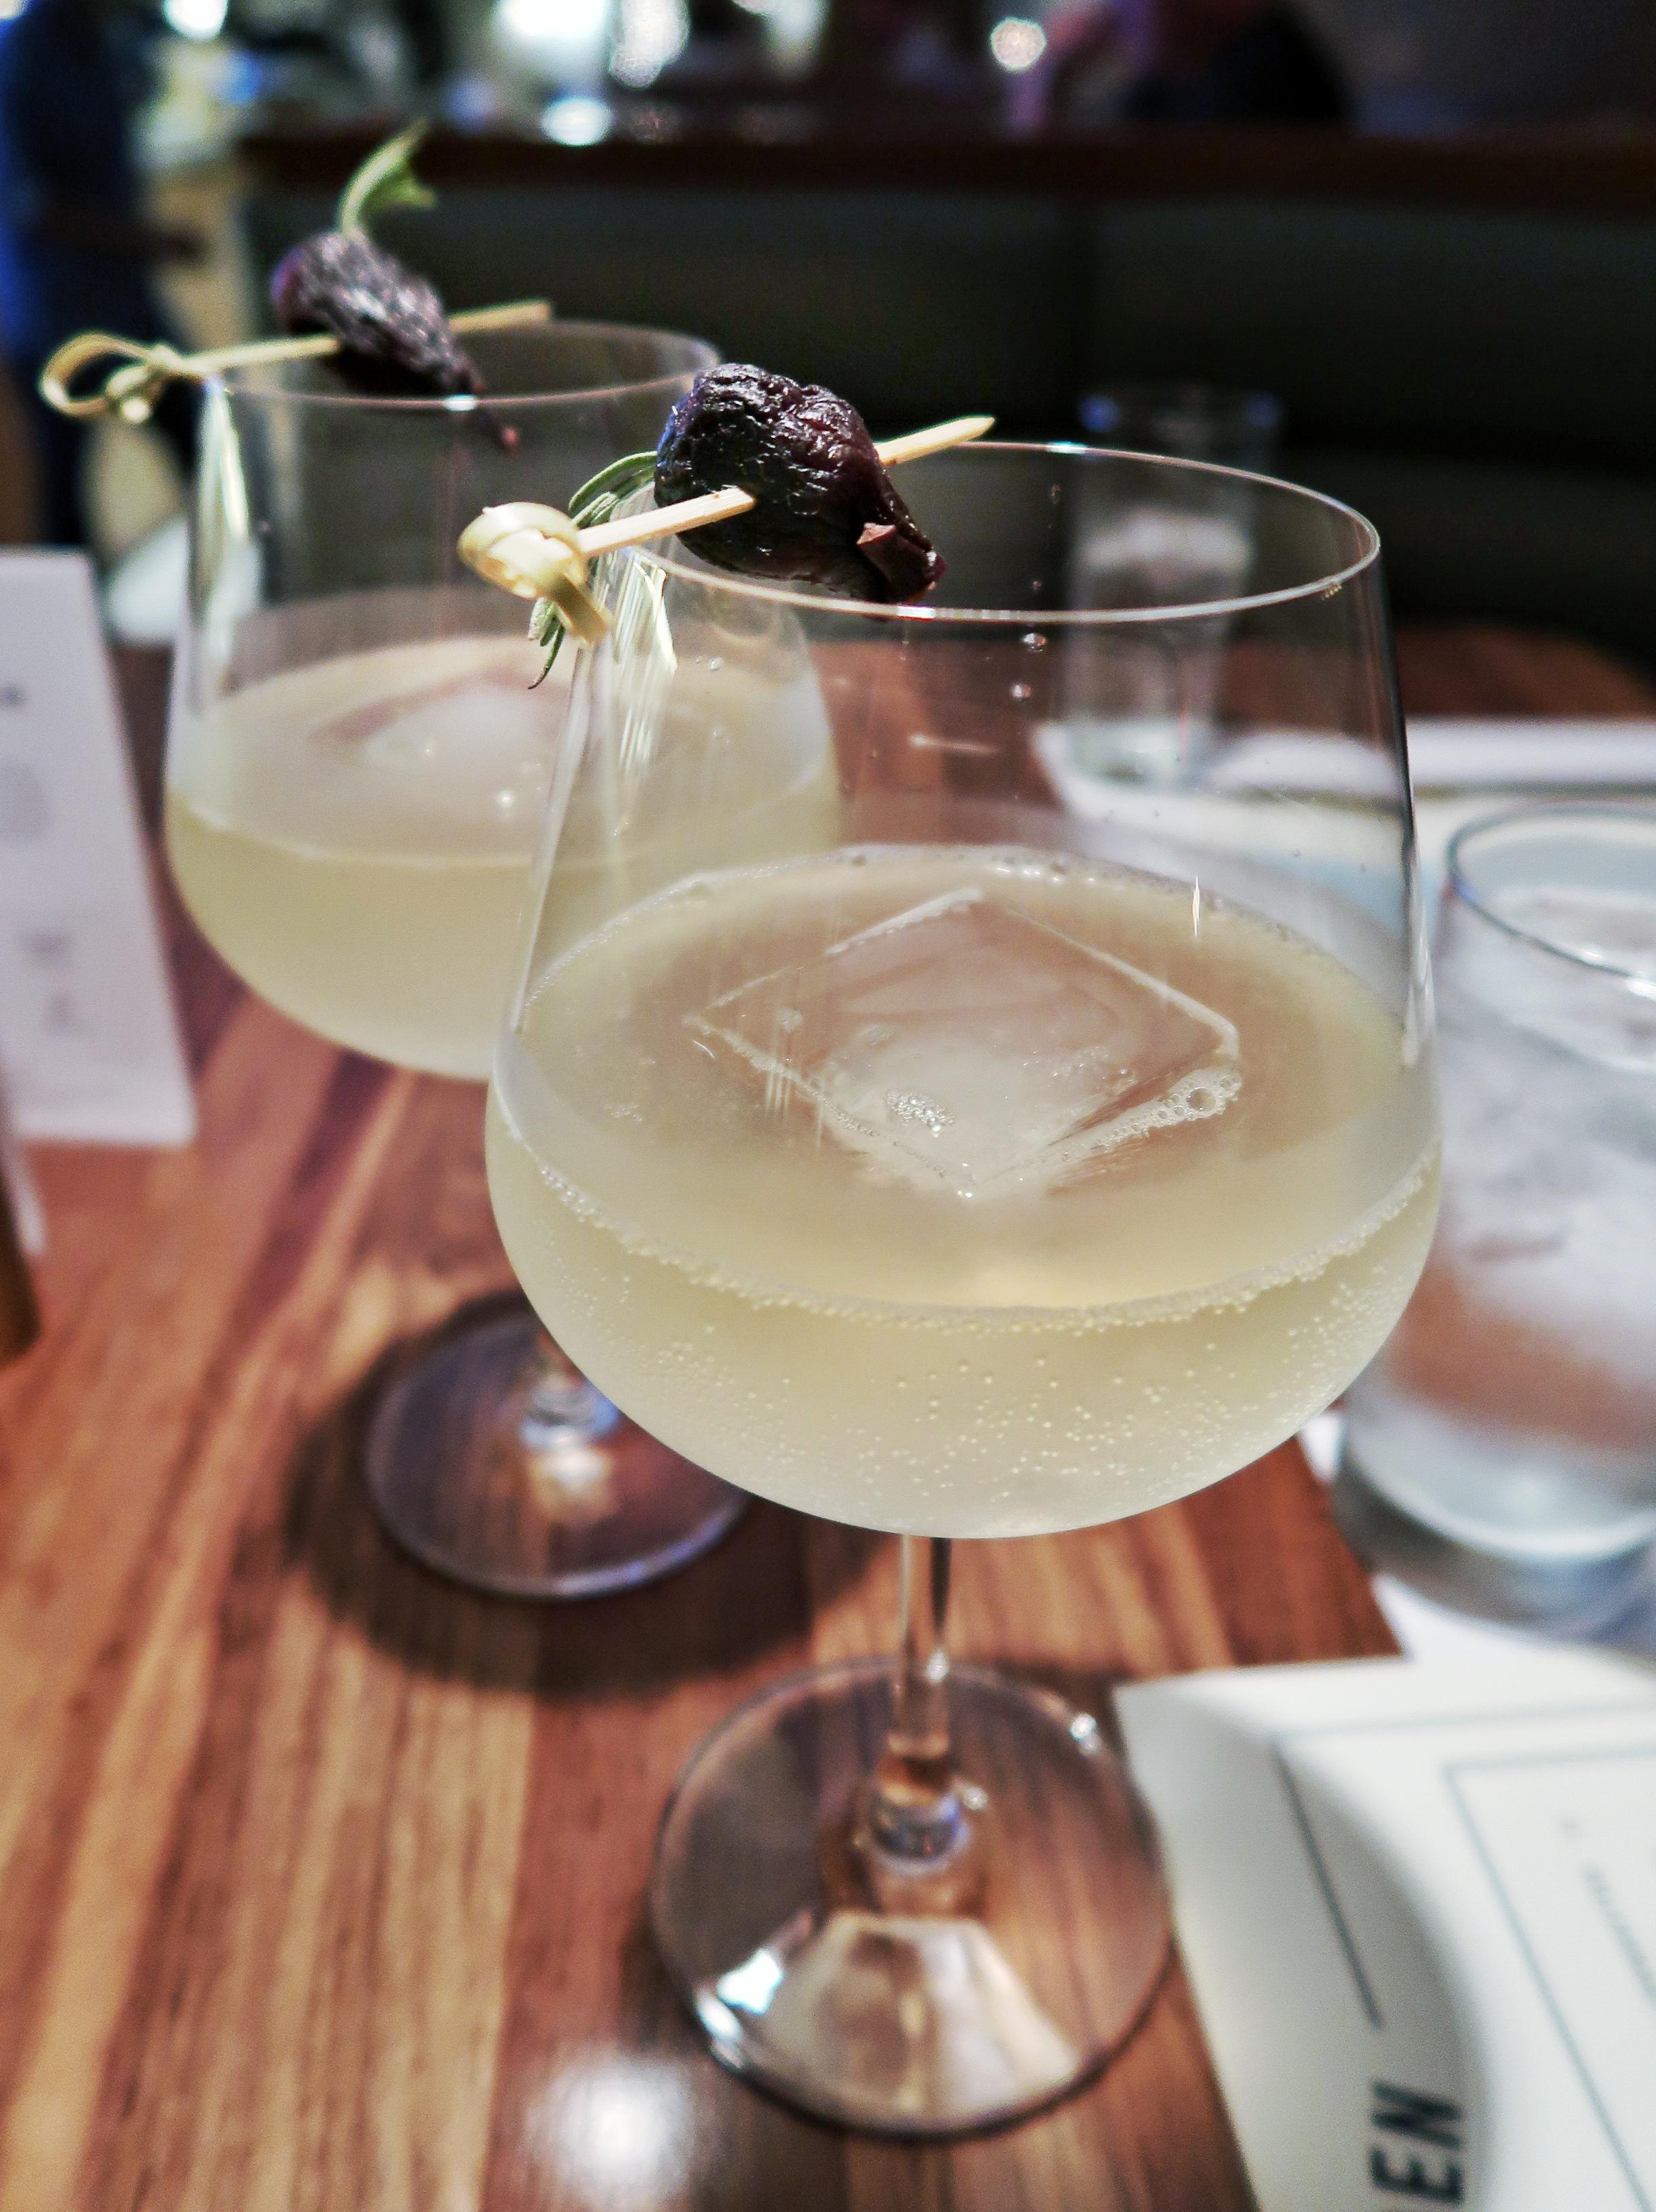 Bloomsbury Garden - Rosemary infused Tanqueray 10, black mission fig marmalade, St. Germain, lemon juice and elderflower tonic